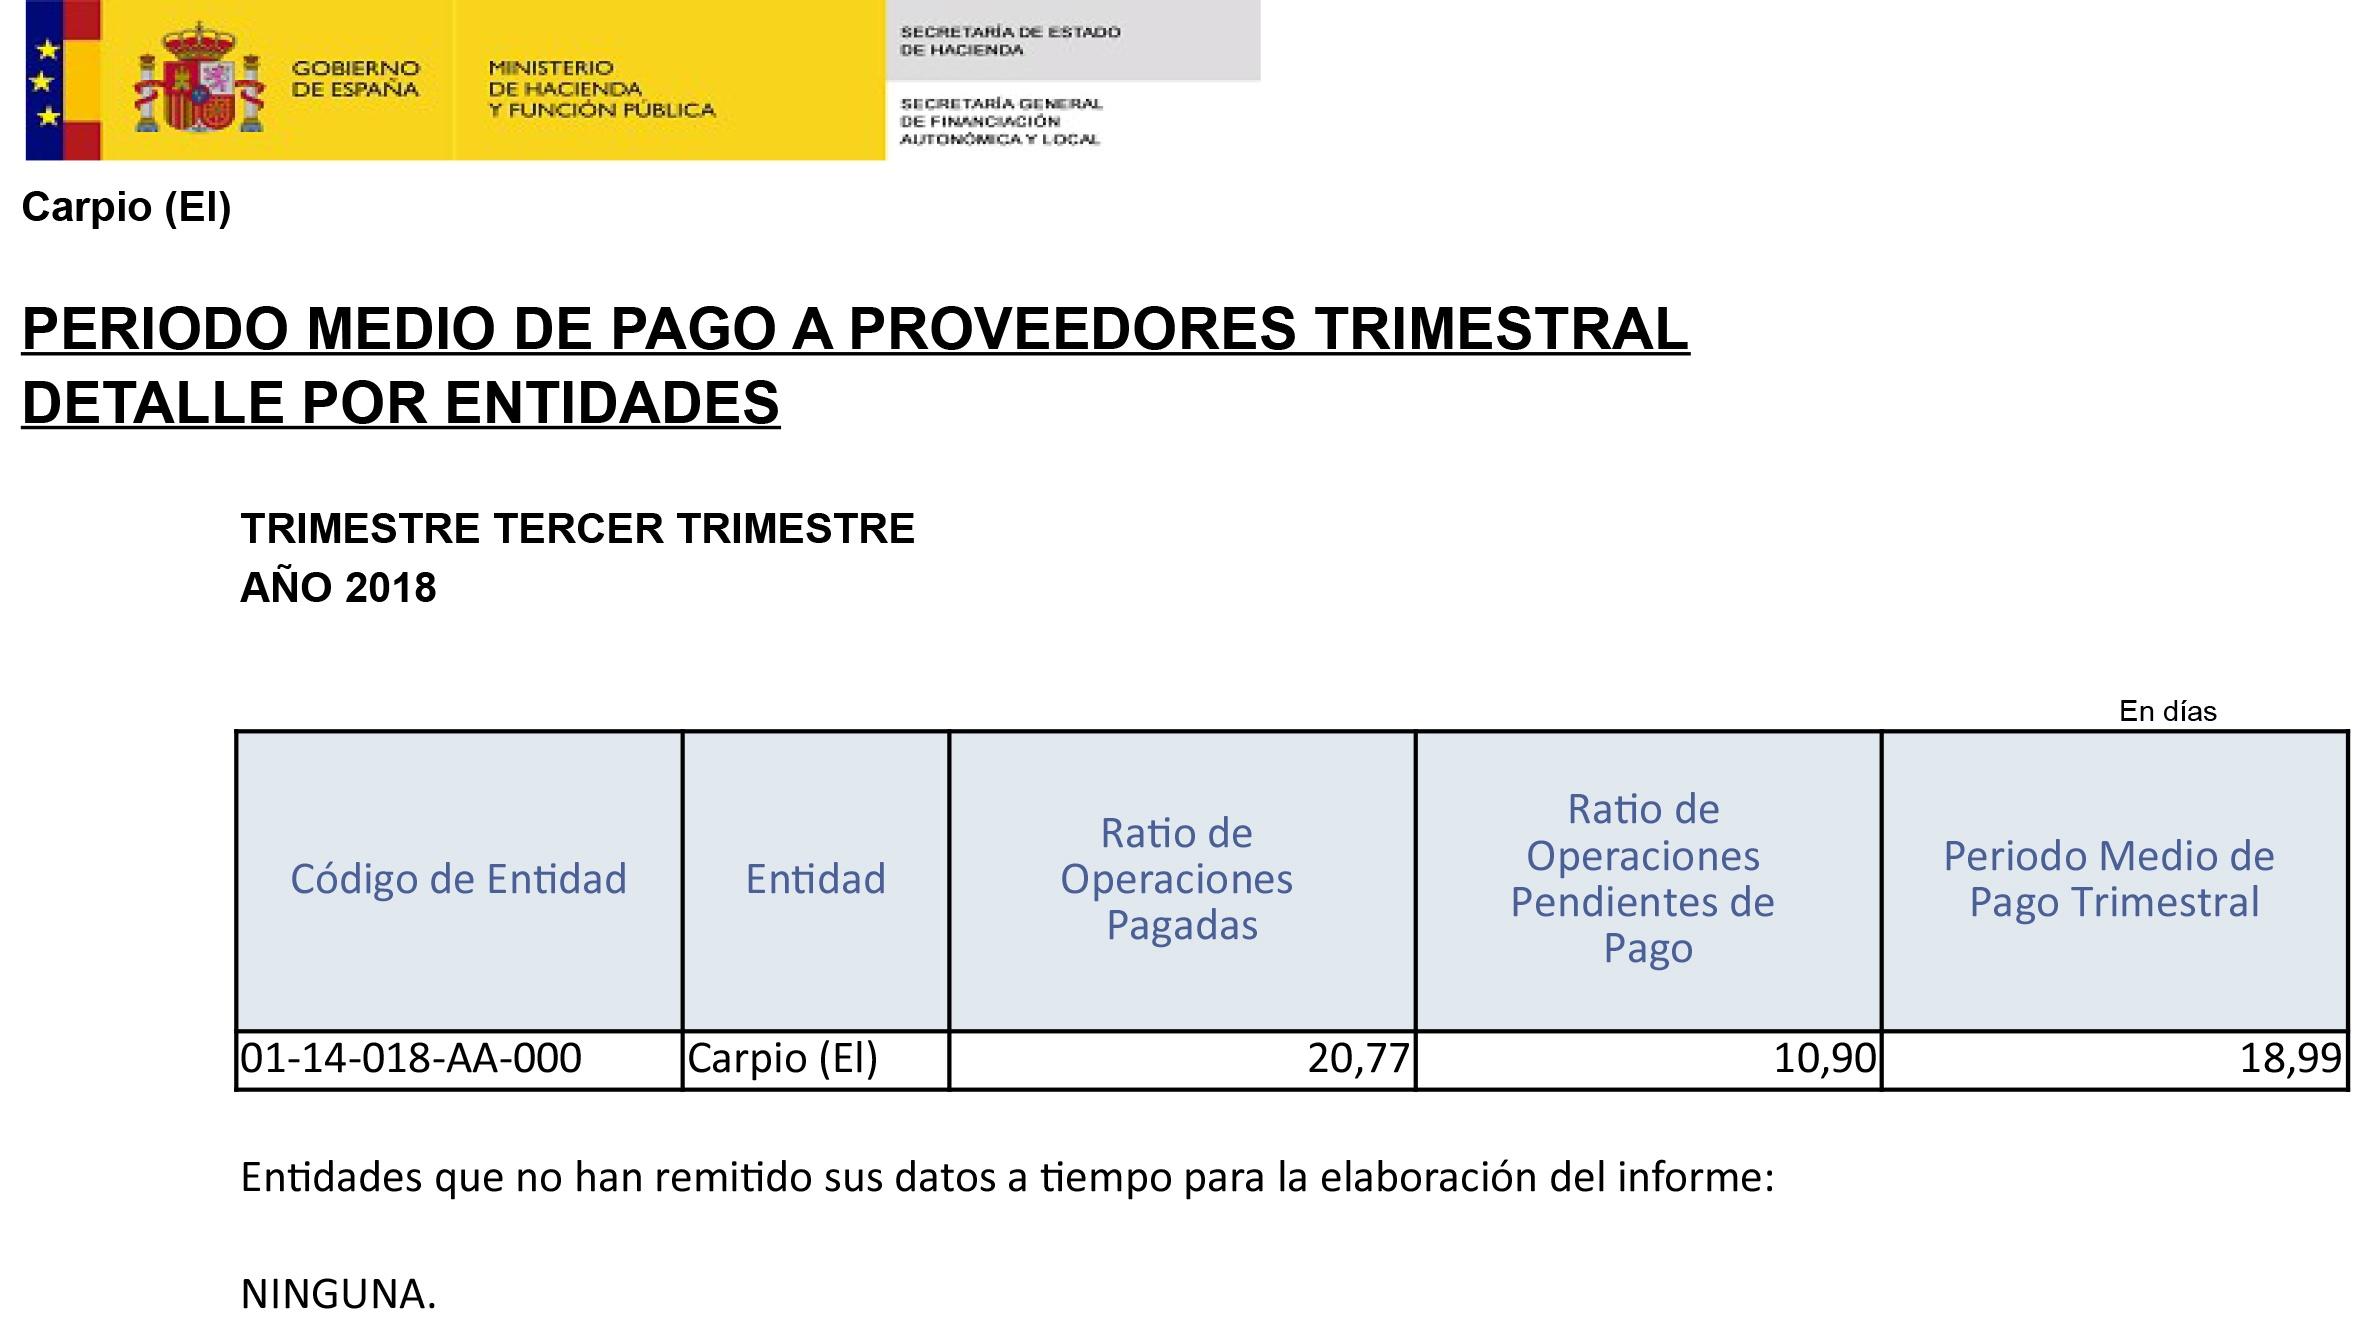 Periodo Medio de Pago a Proveedores 2018 - Tercer Trimestre 2